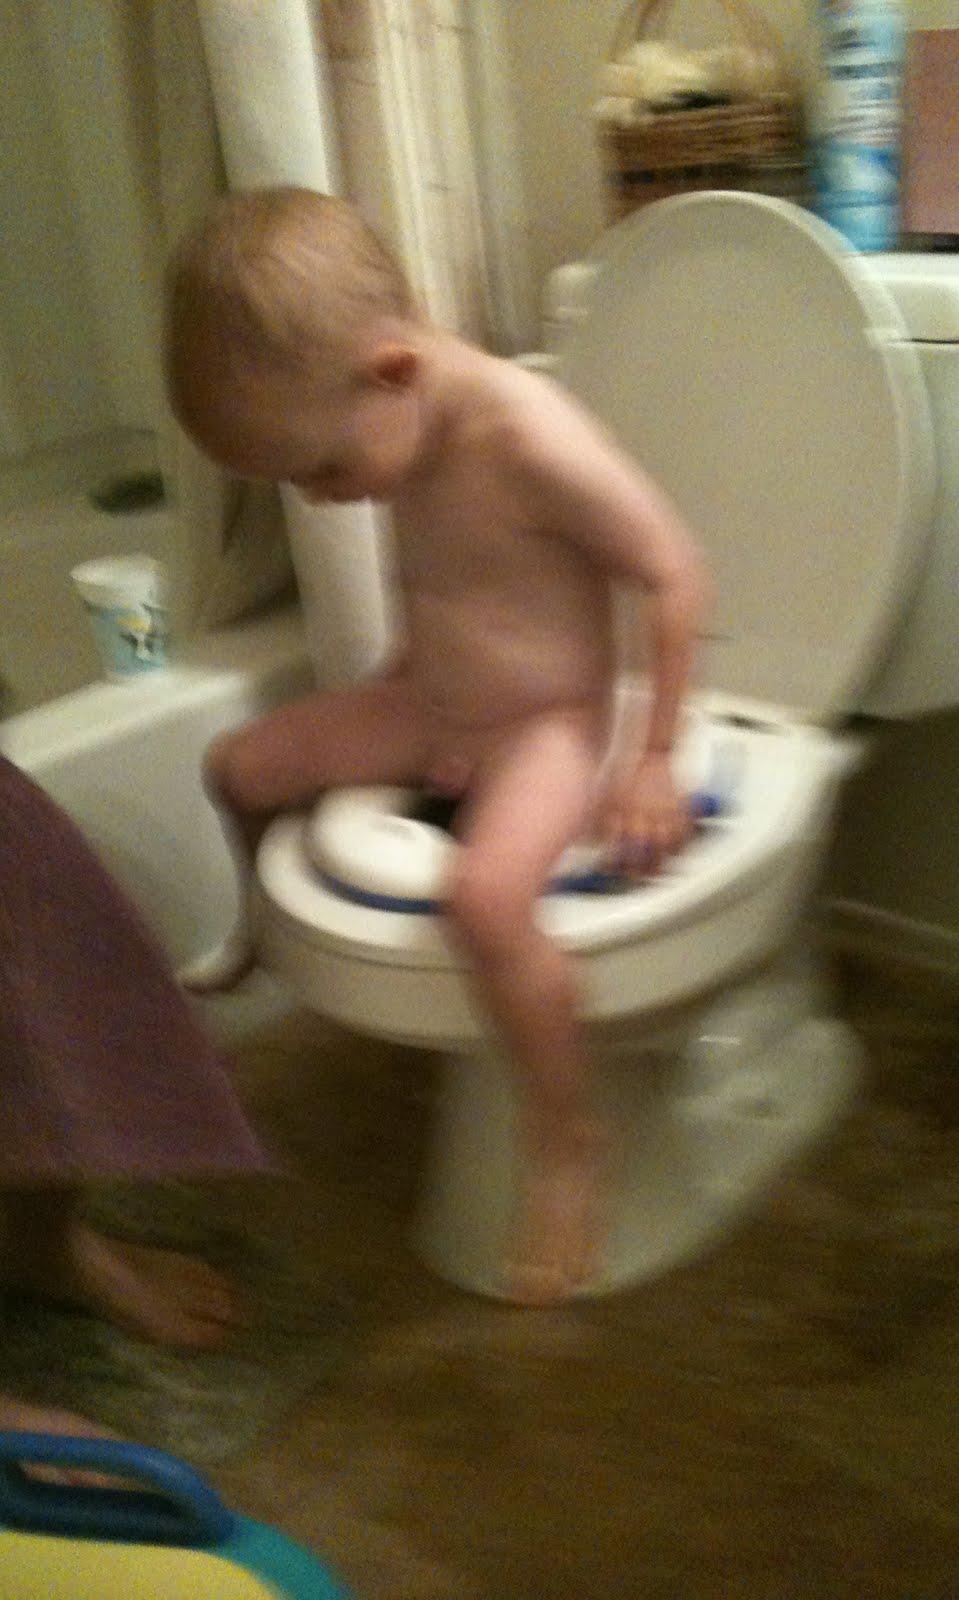 Boy potty training naked